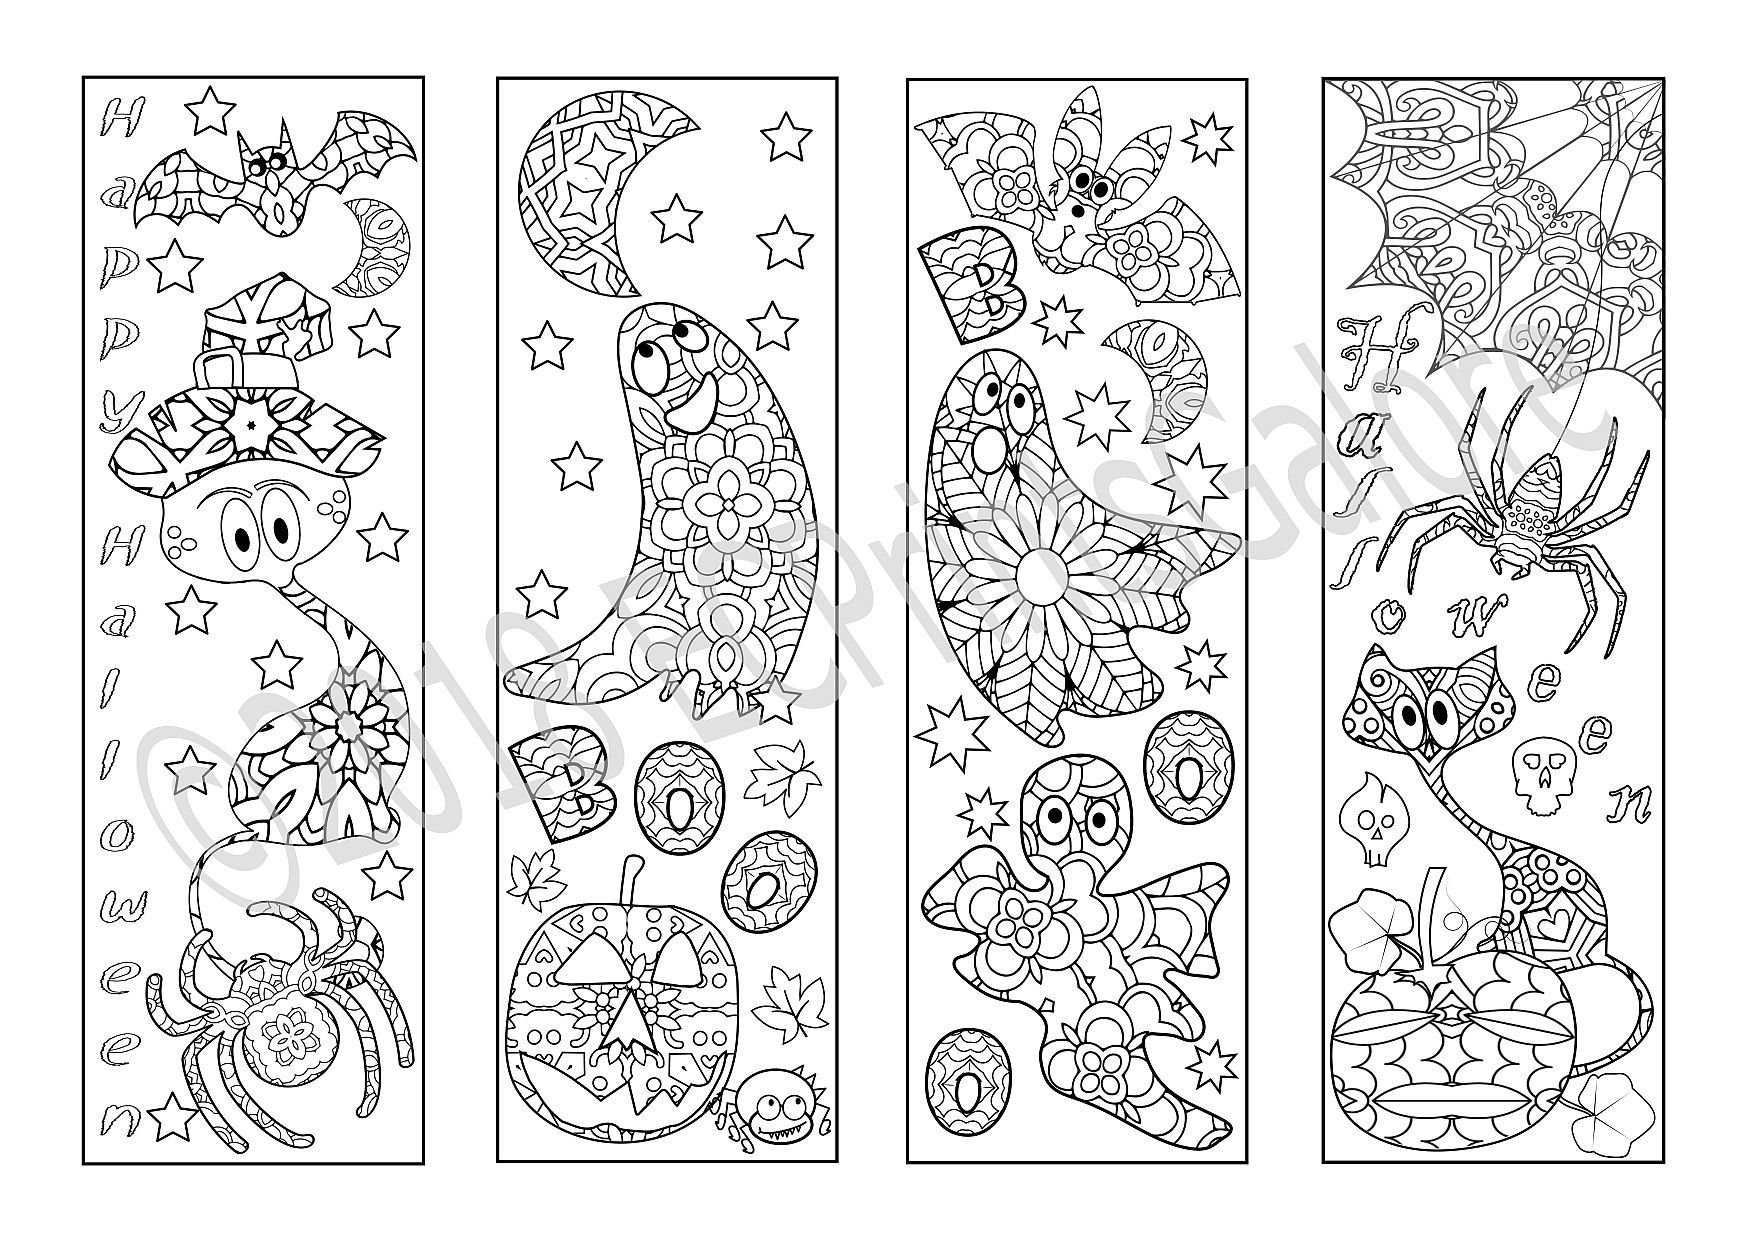 Halloween Coloring Bookmarks Printable Halloween Bookmarks Pdf Etsy Coloring Bookmarks Halloween Coloring Halloween Coloring Pages